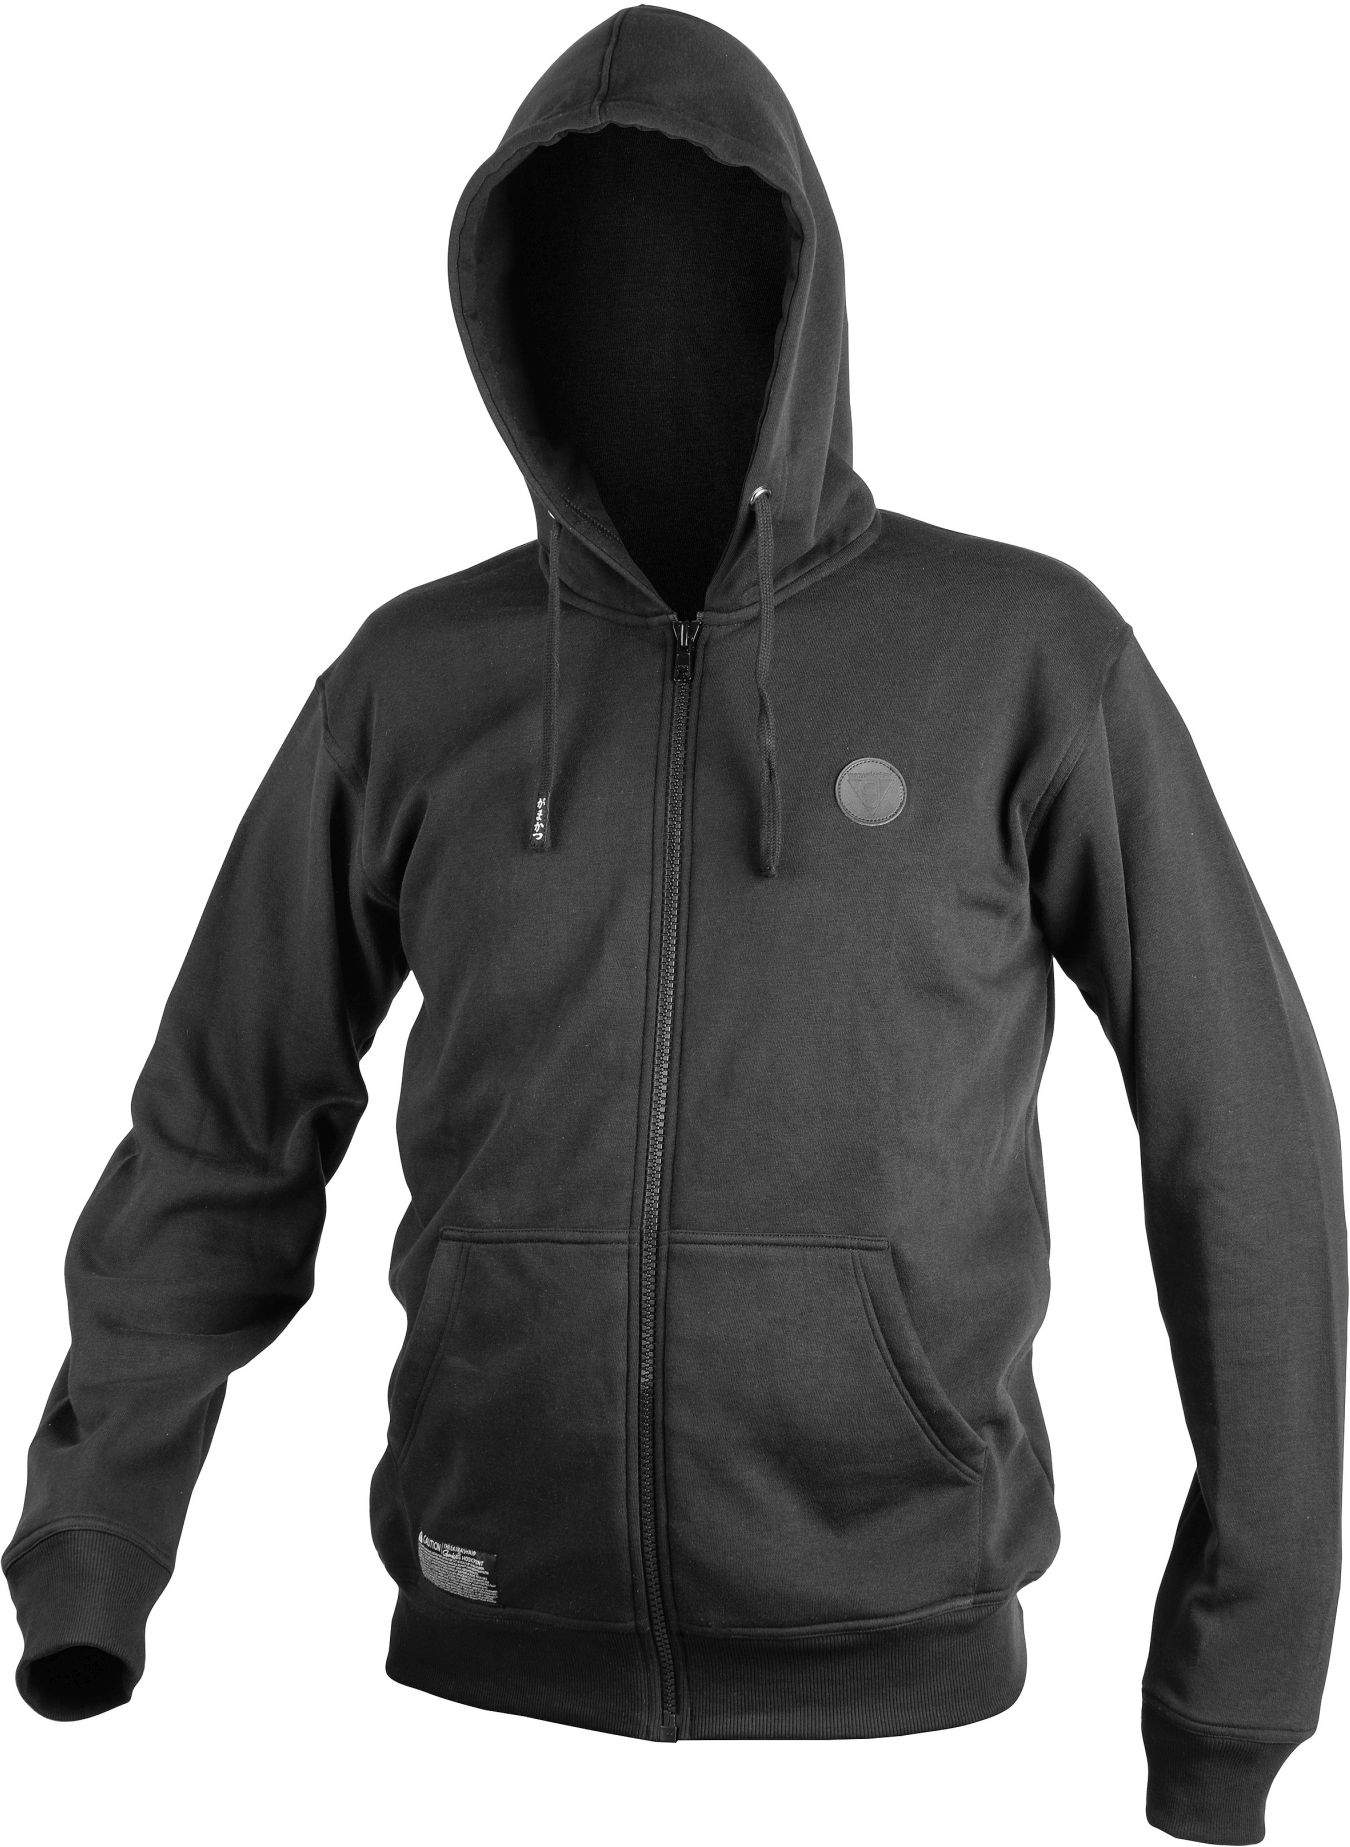 Bekleidung Hoody Gamakatsu All Black XXXL Kapuzenpulli Hemden & T-Shirts